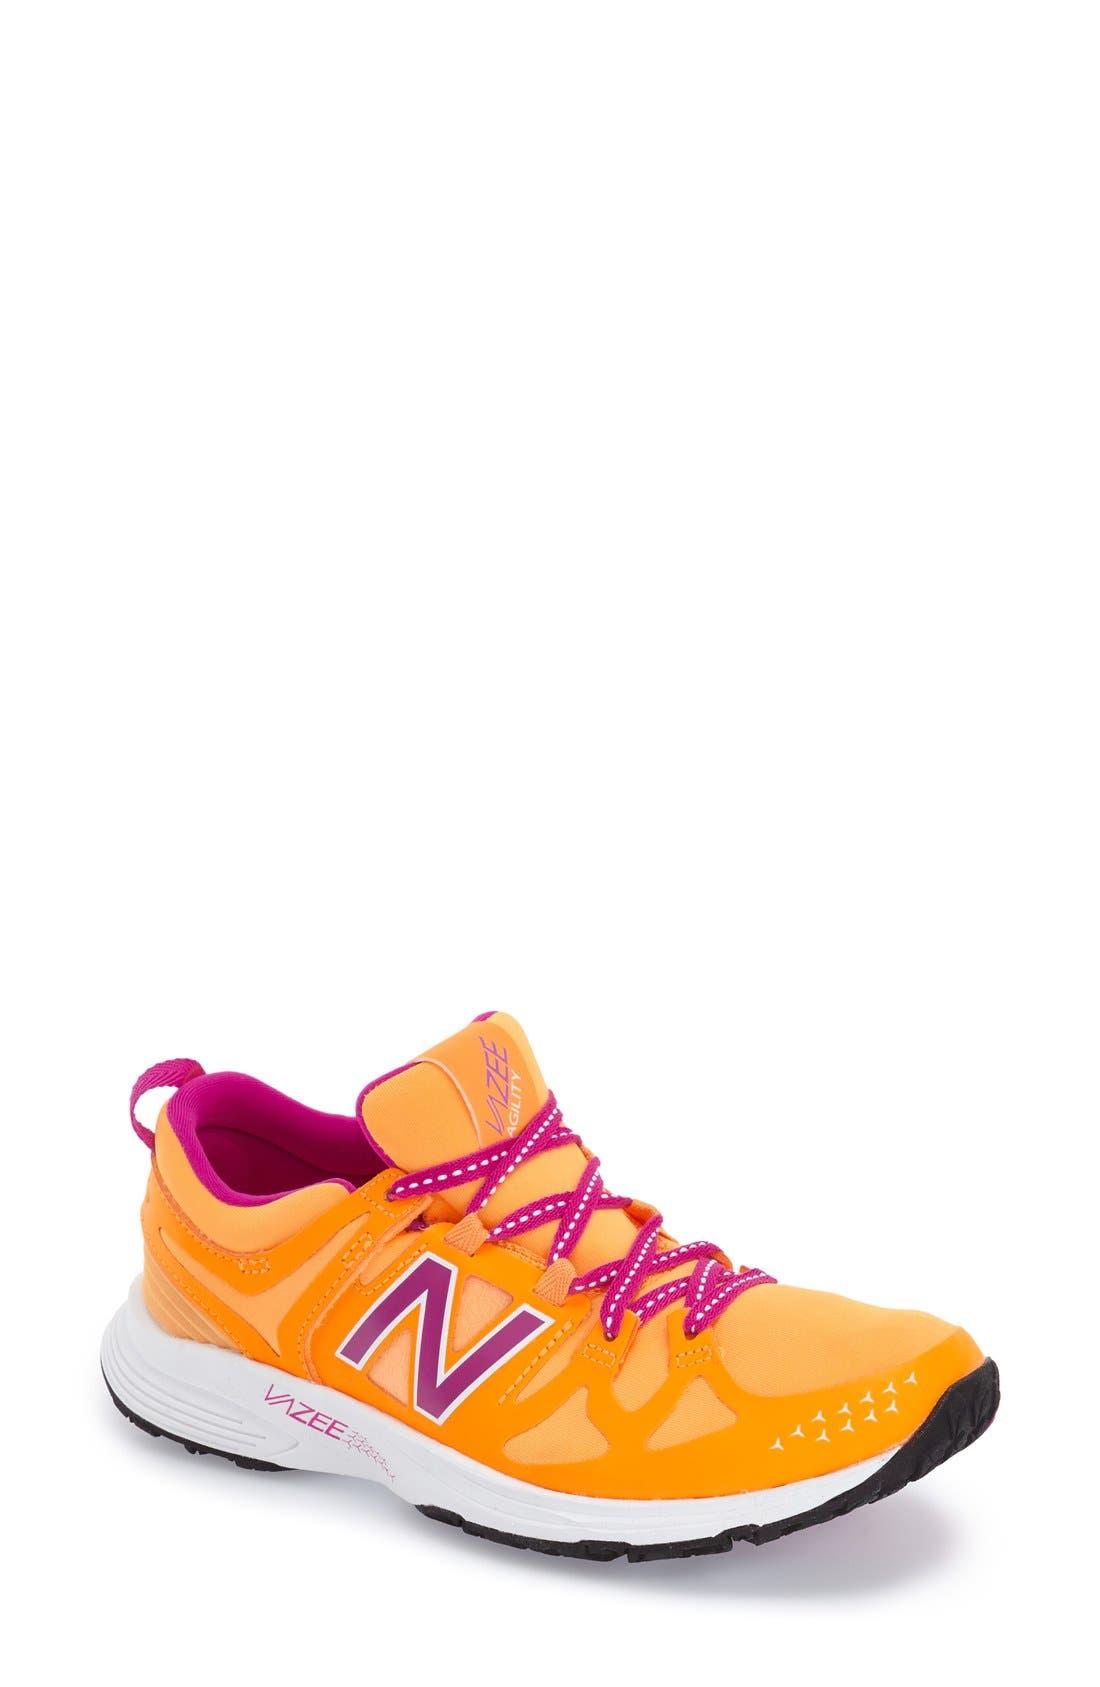 Main Image - New Balance 'Vazee Agility' Running Shoe (Women)